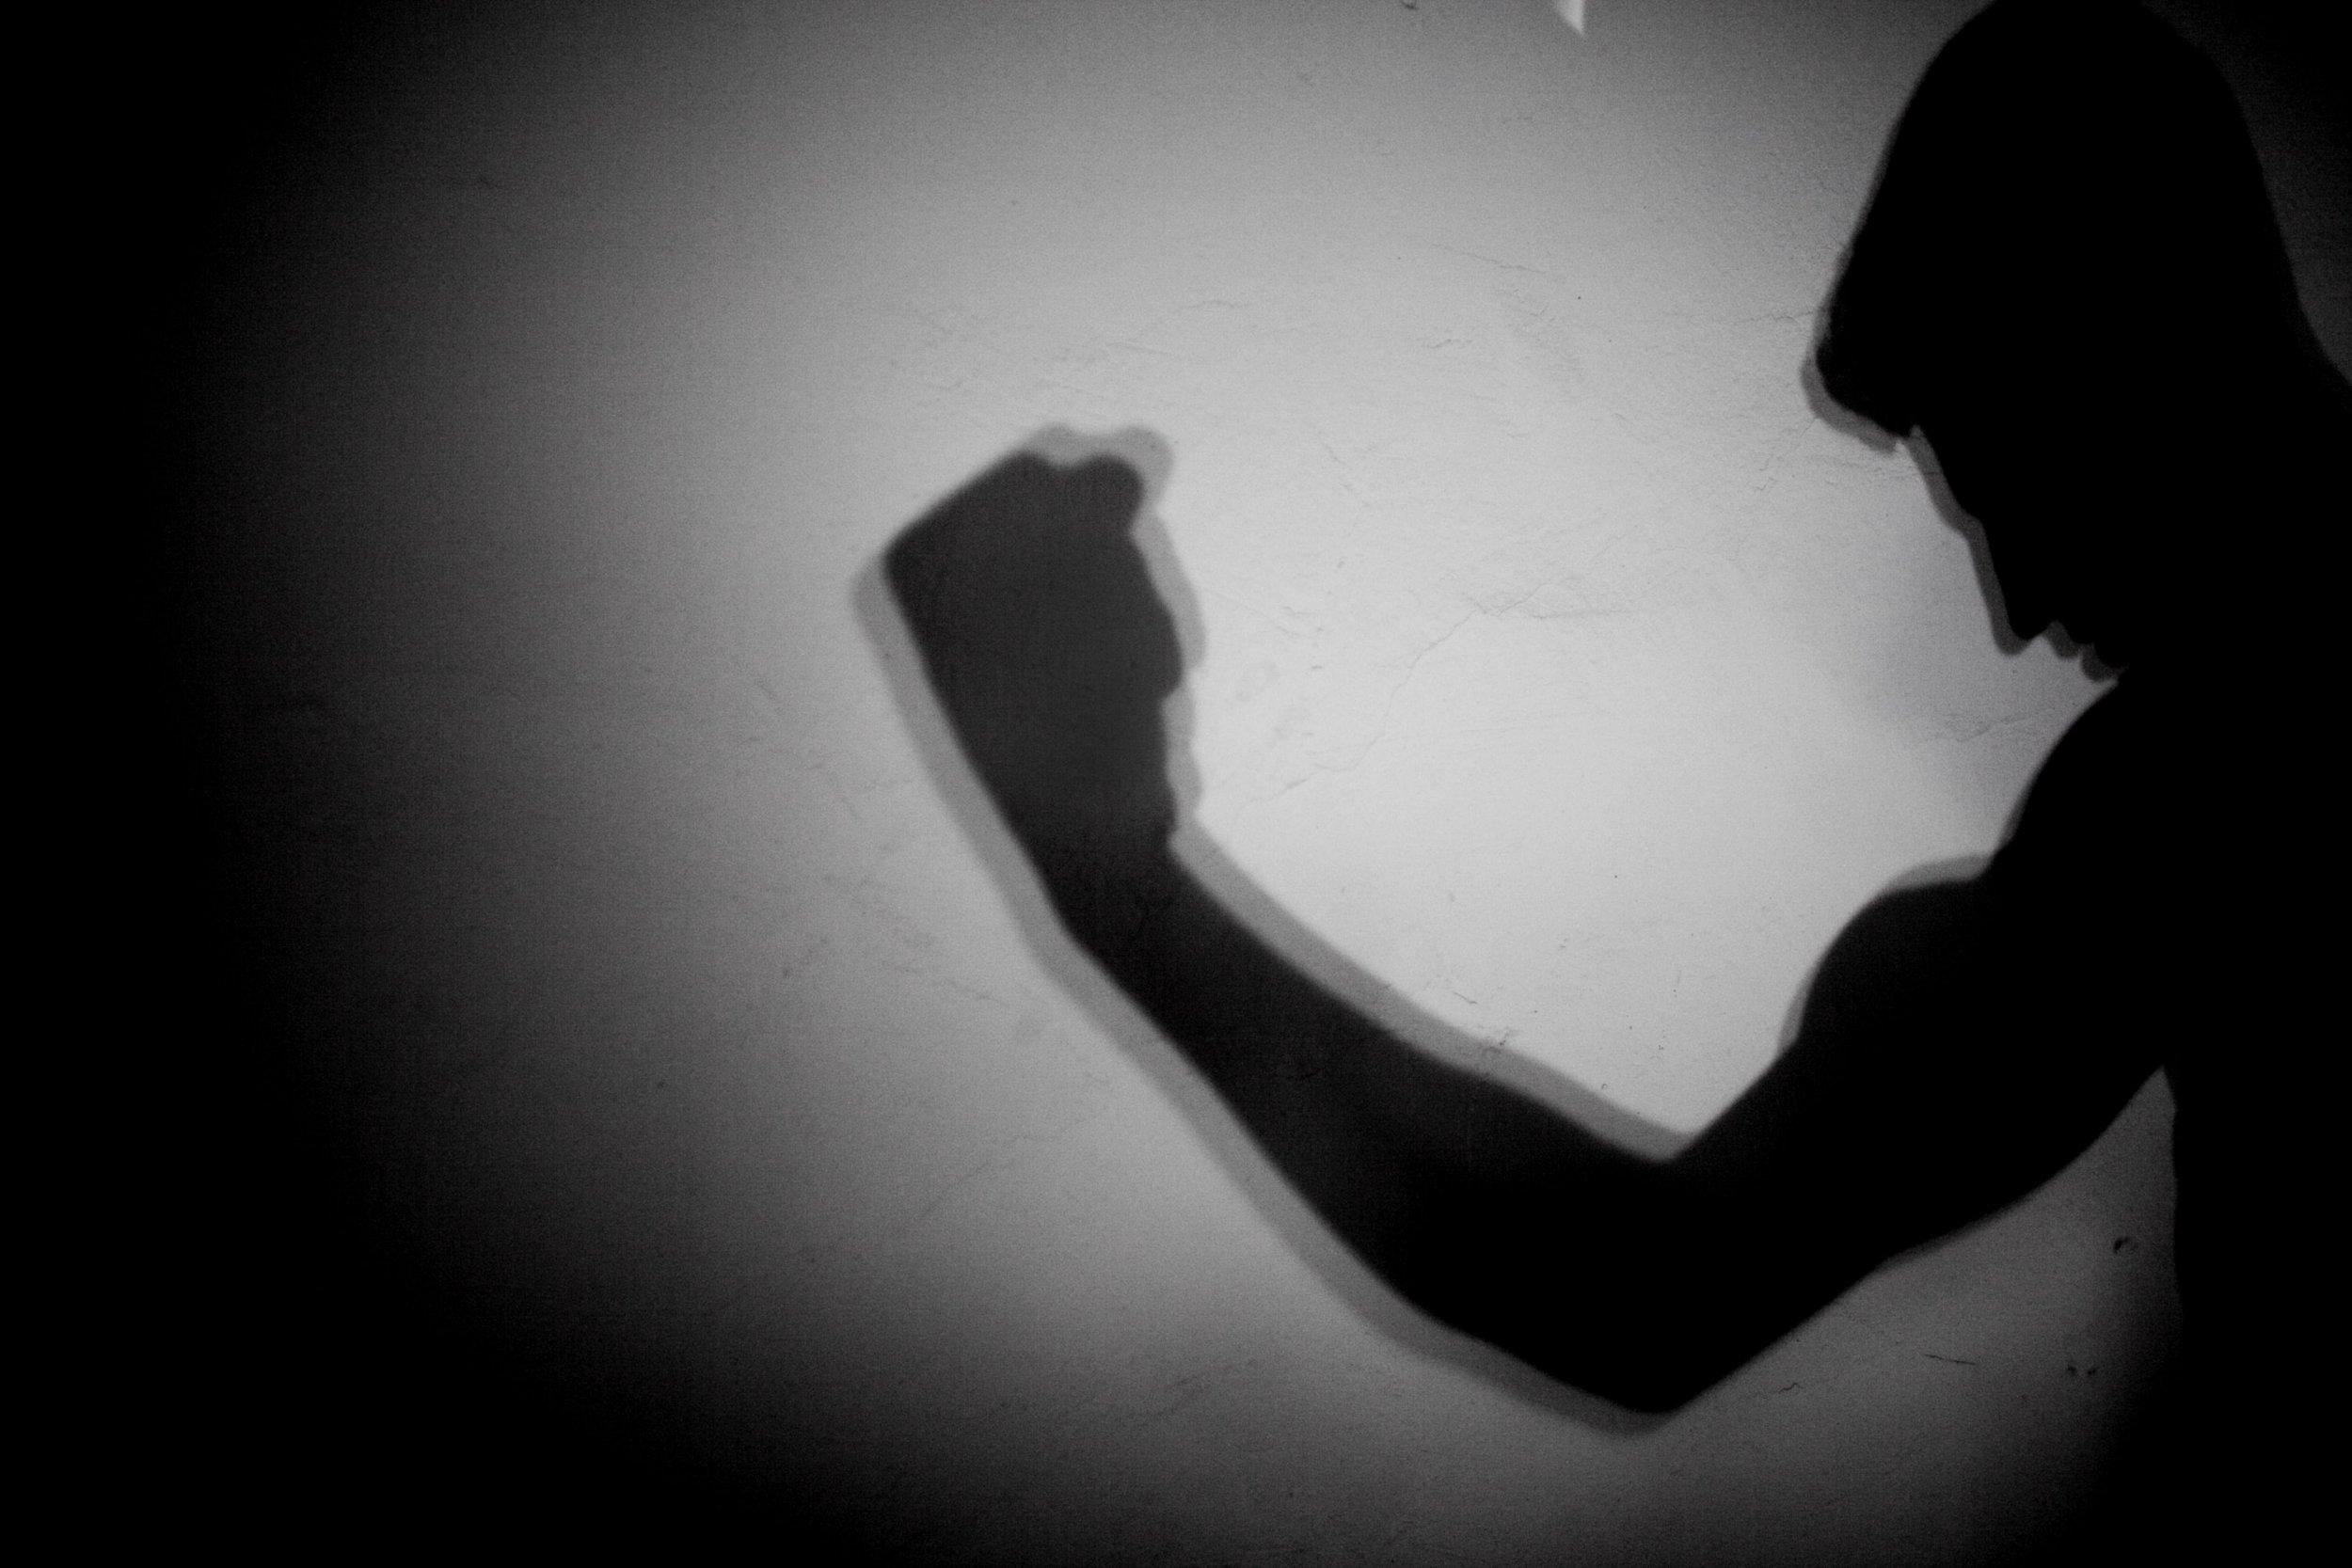 A bodybuilder flexes his muscles